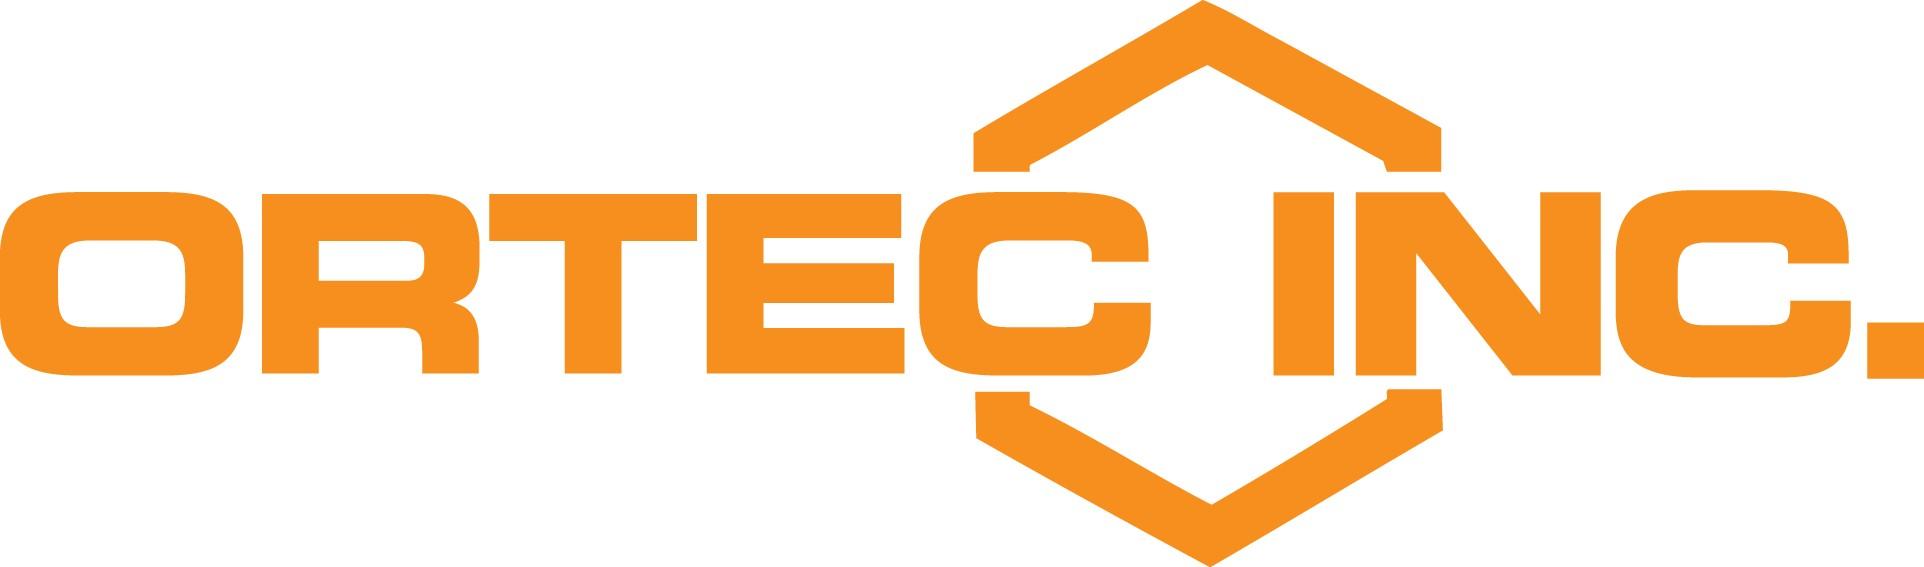 Ortec logo